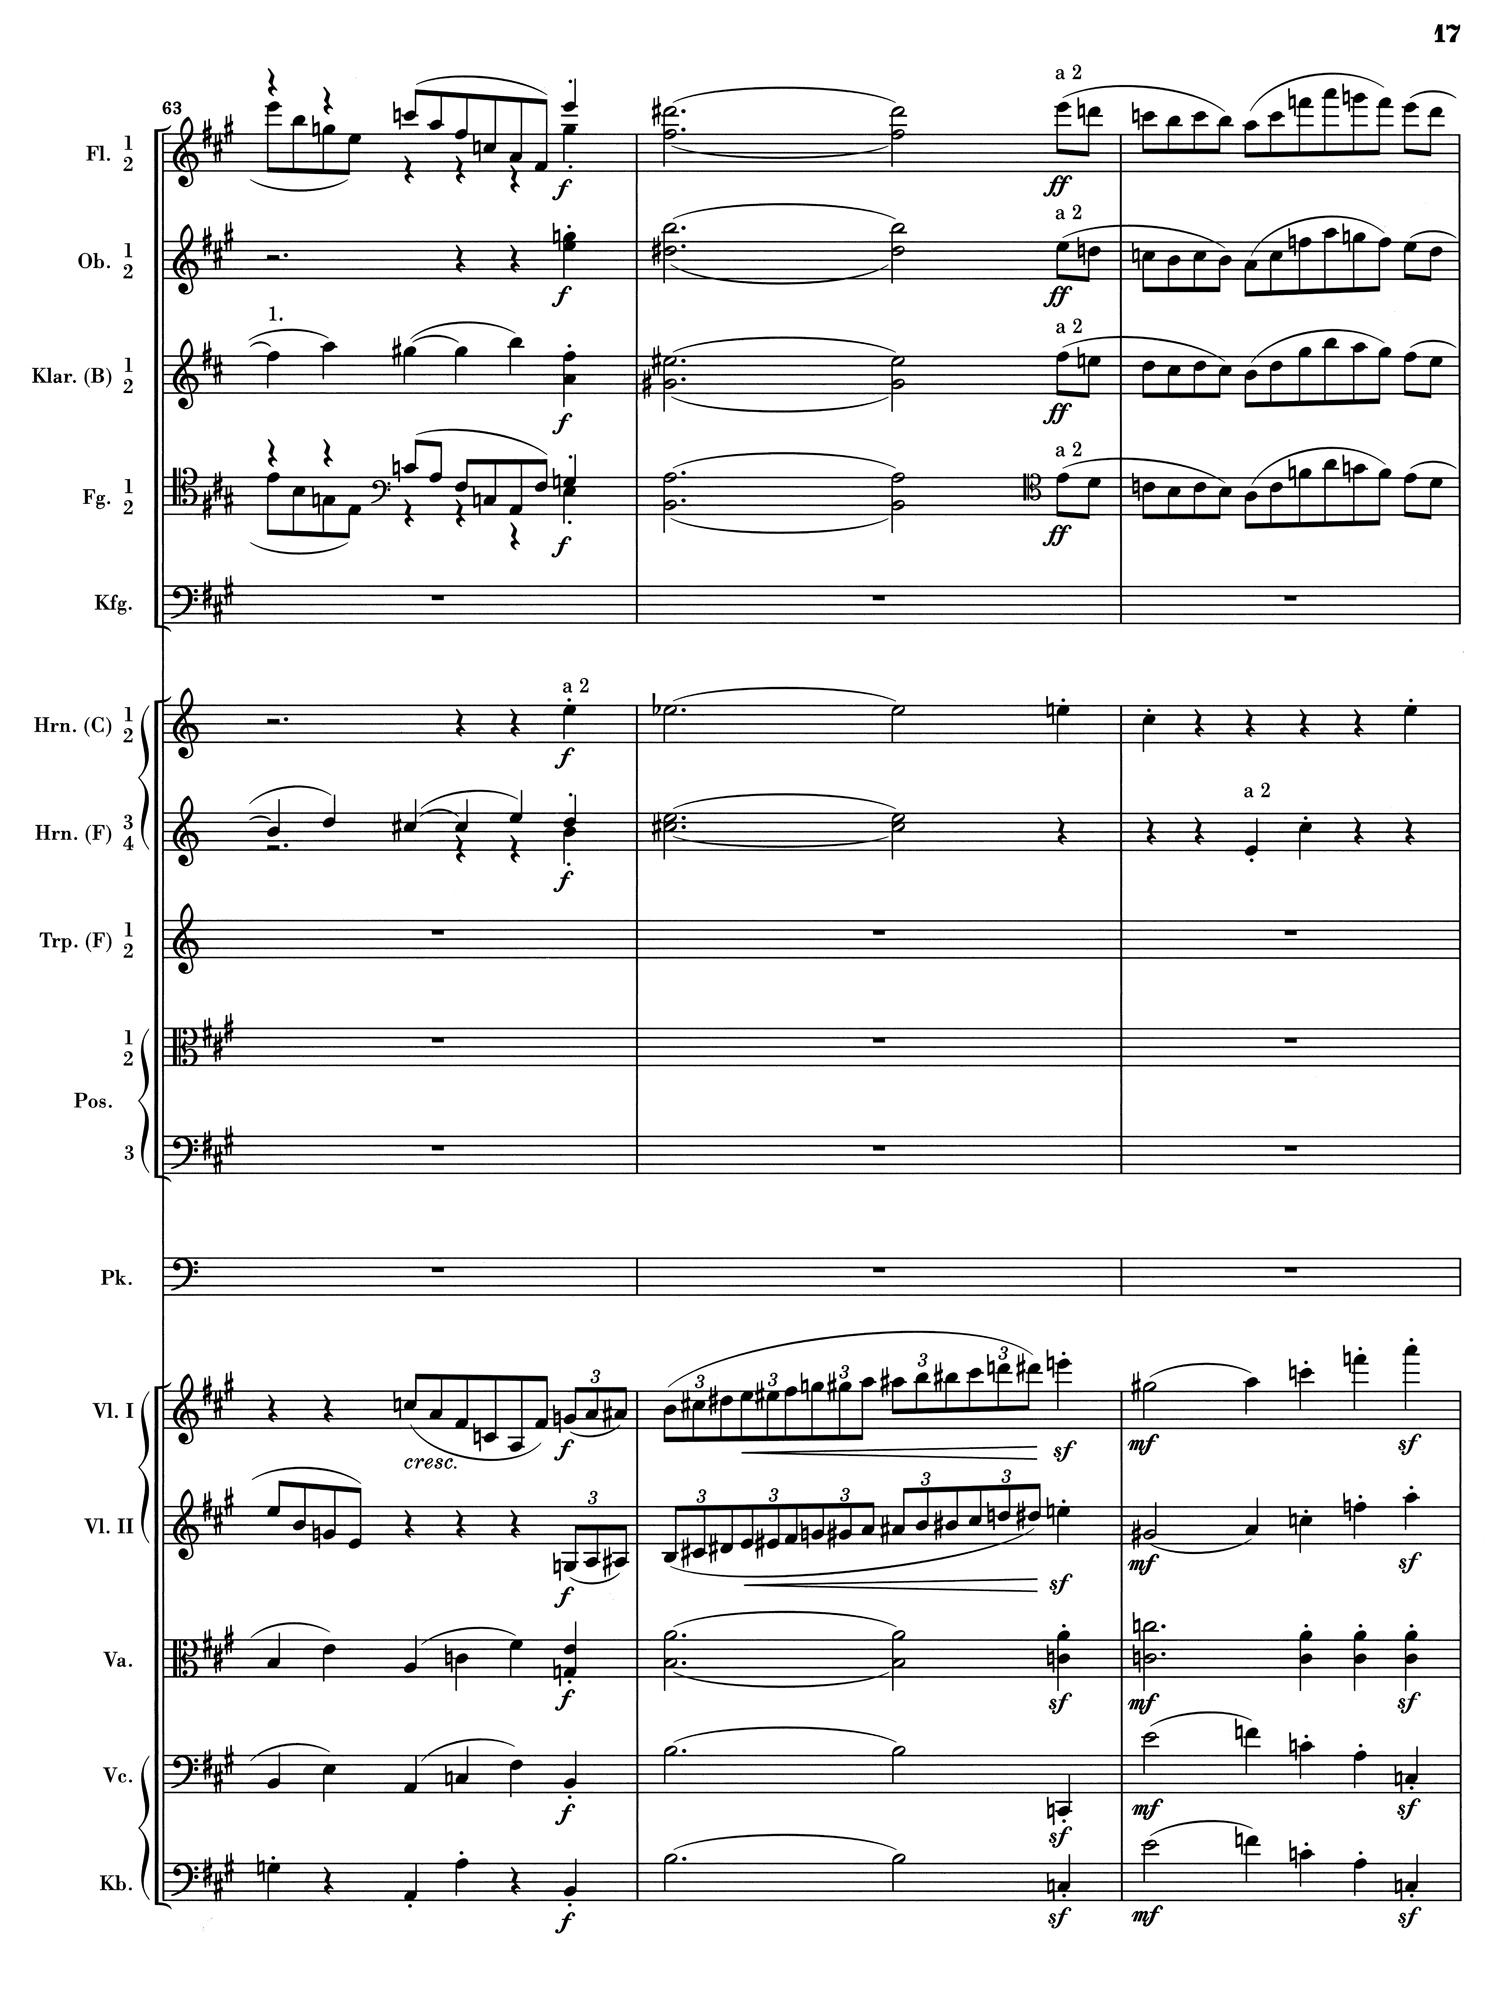 Brahms 3 Score 2.jpg